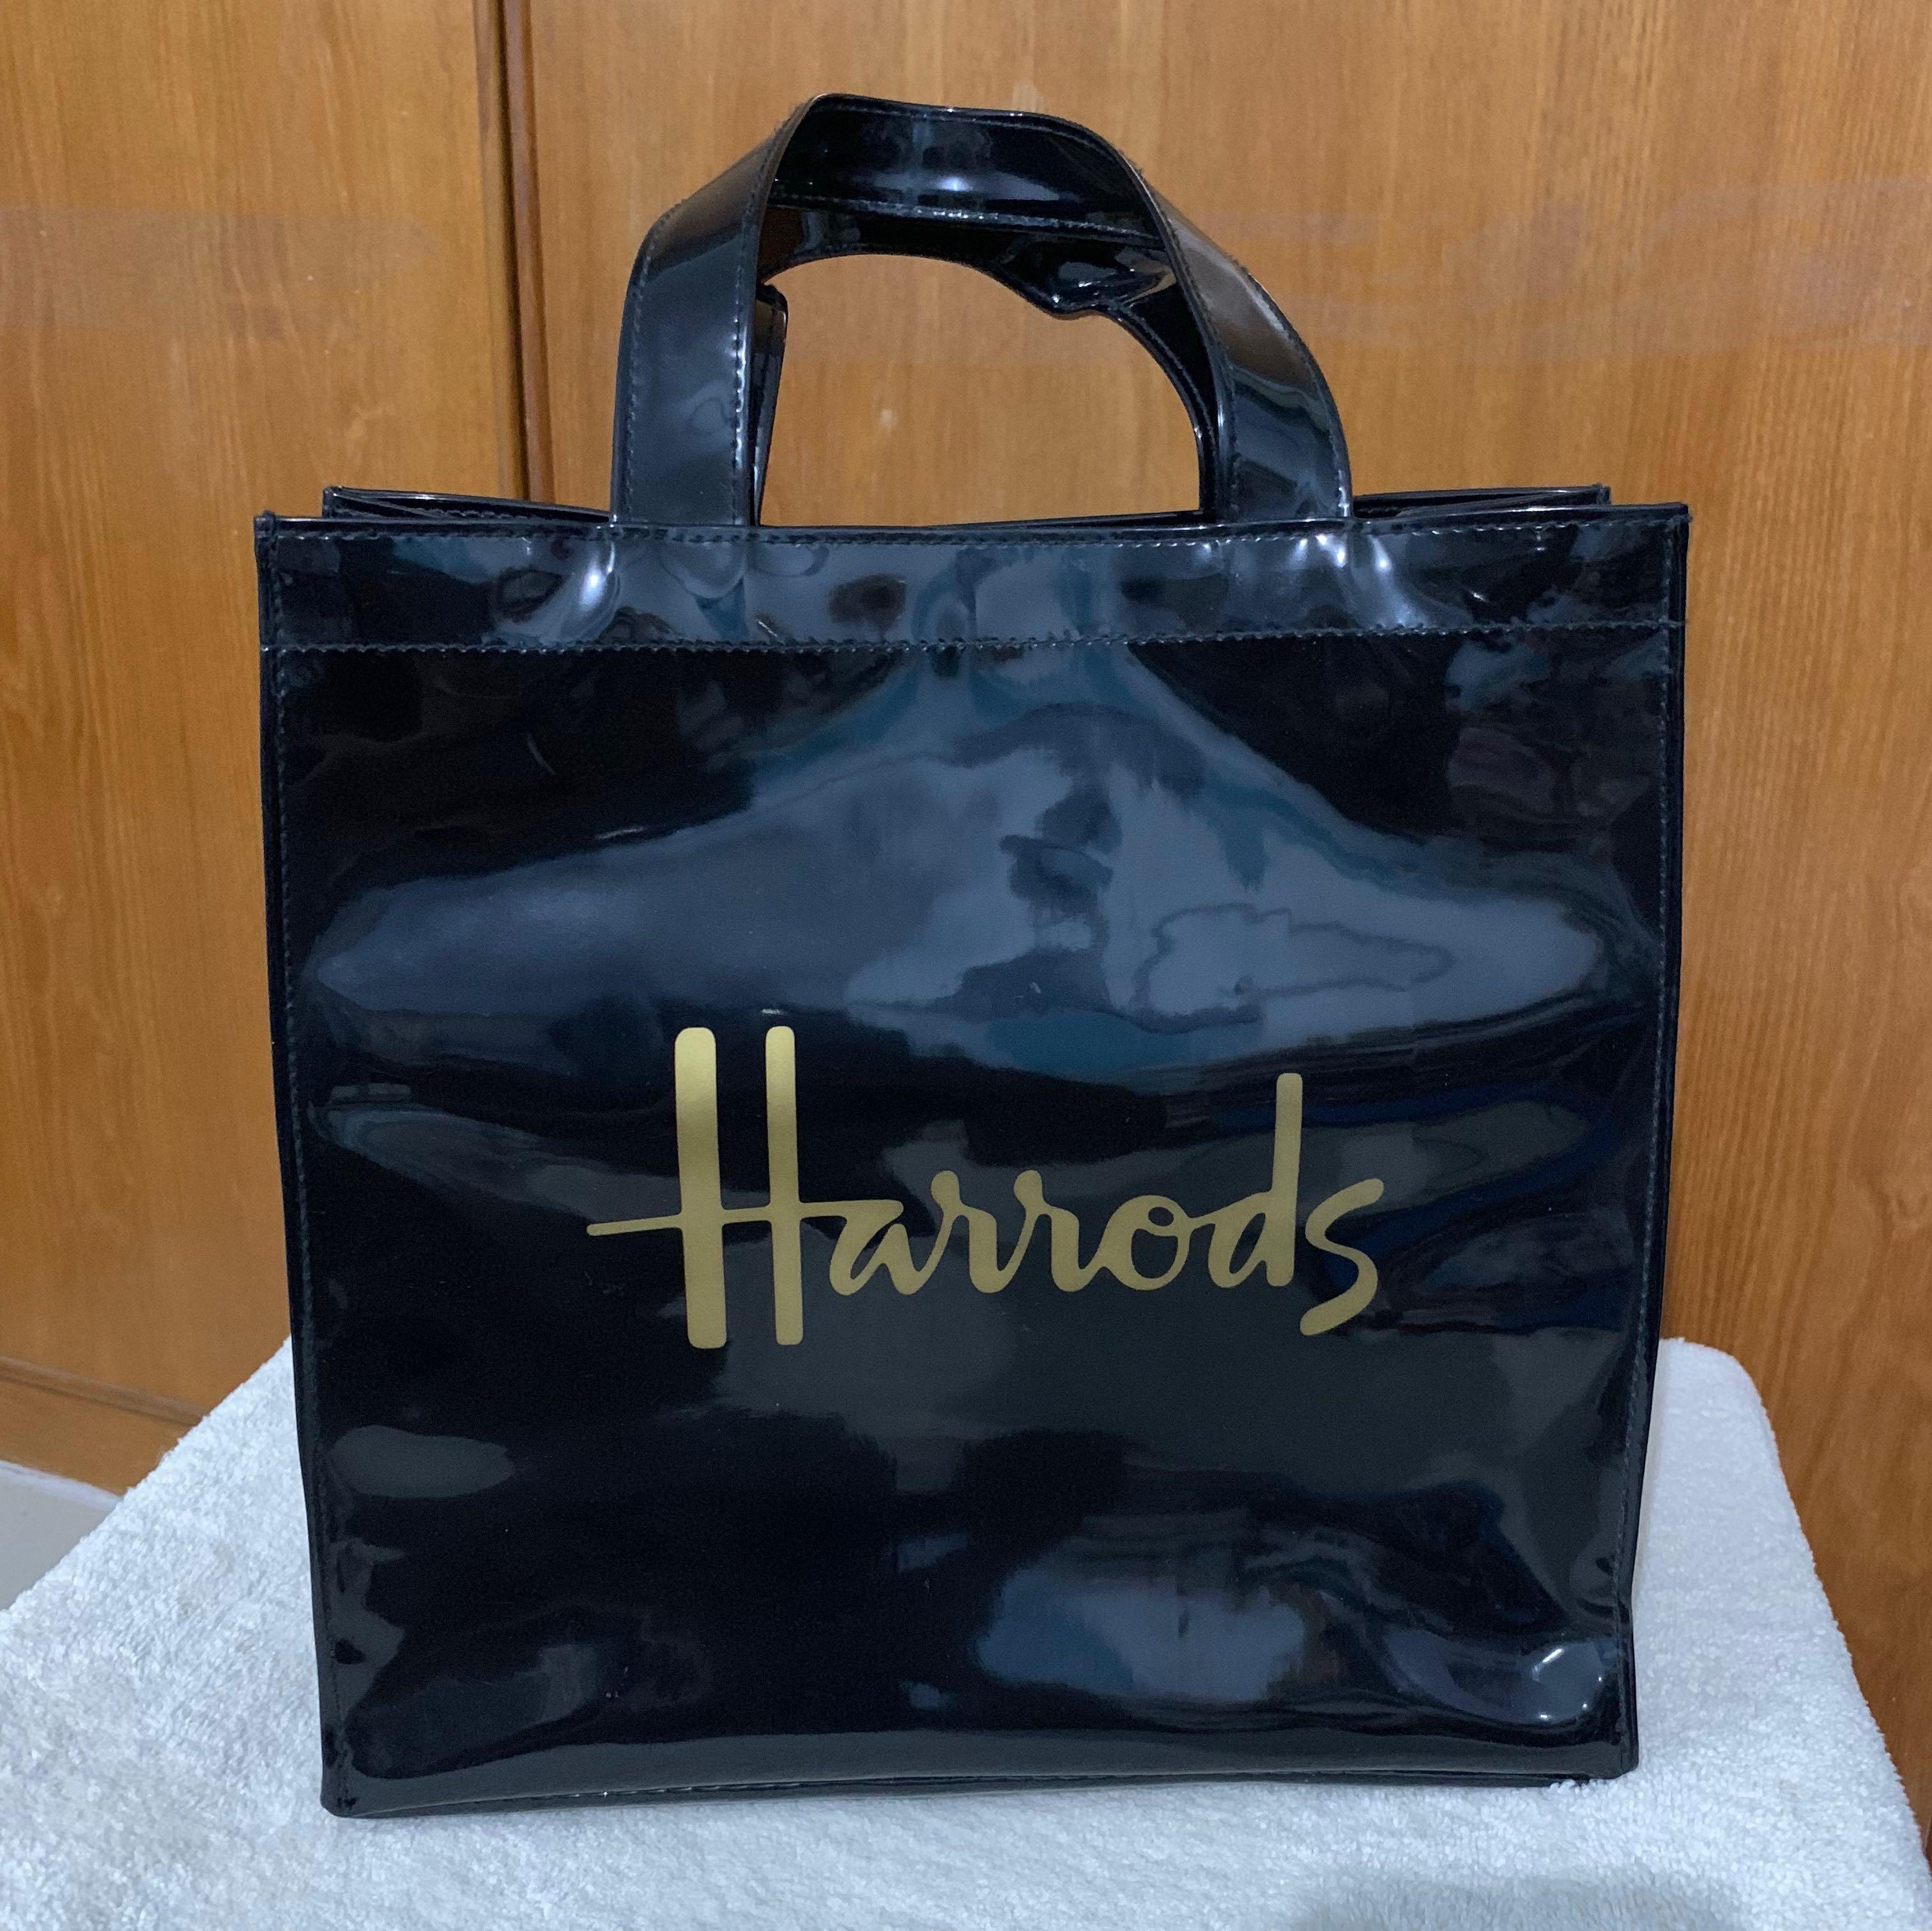 Harrods Ping Bag Women S Fashion Bags Wallets Handbags On Carou